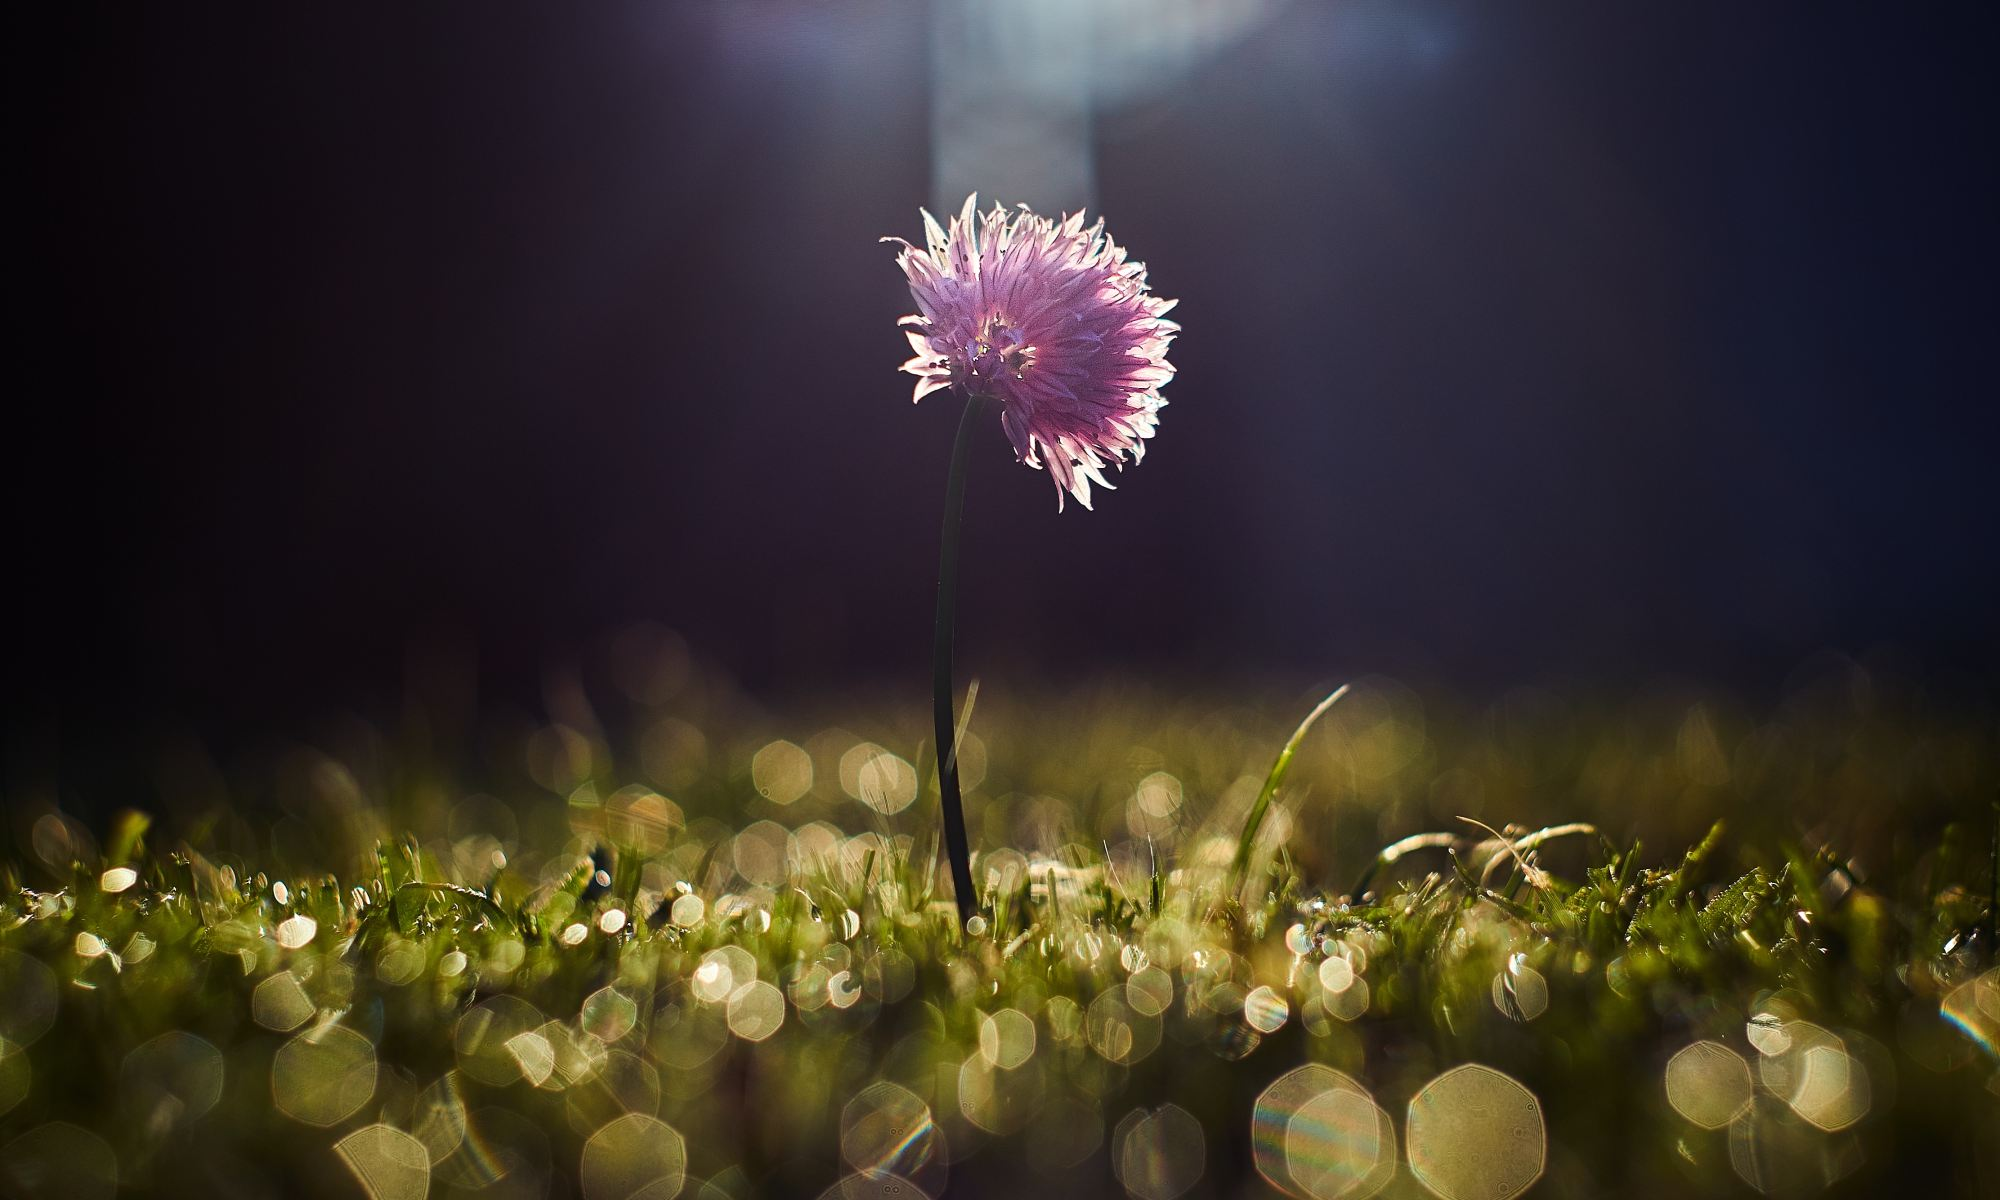 Single purple flower growing on lawn at night